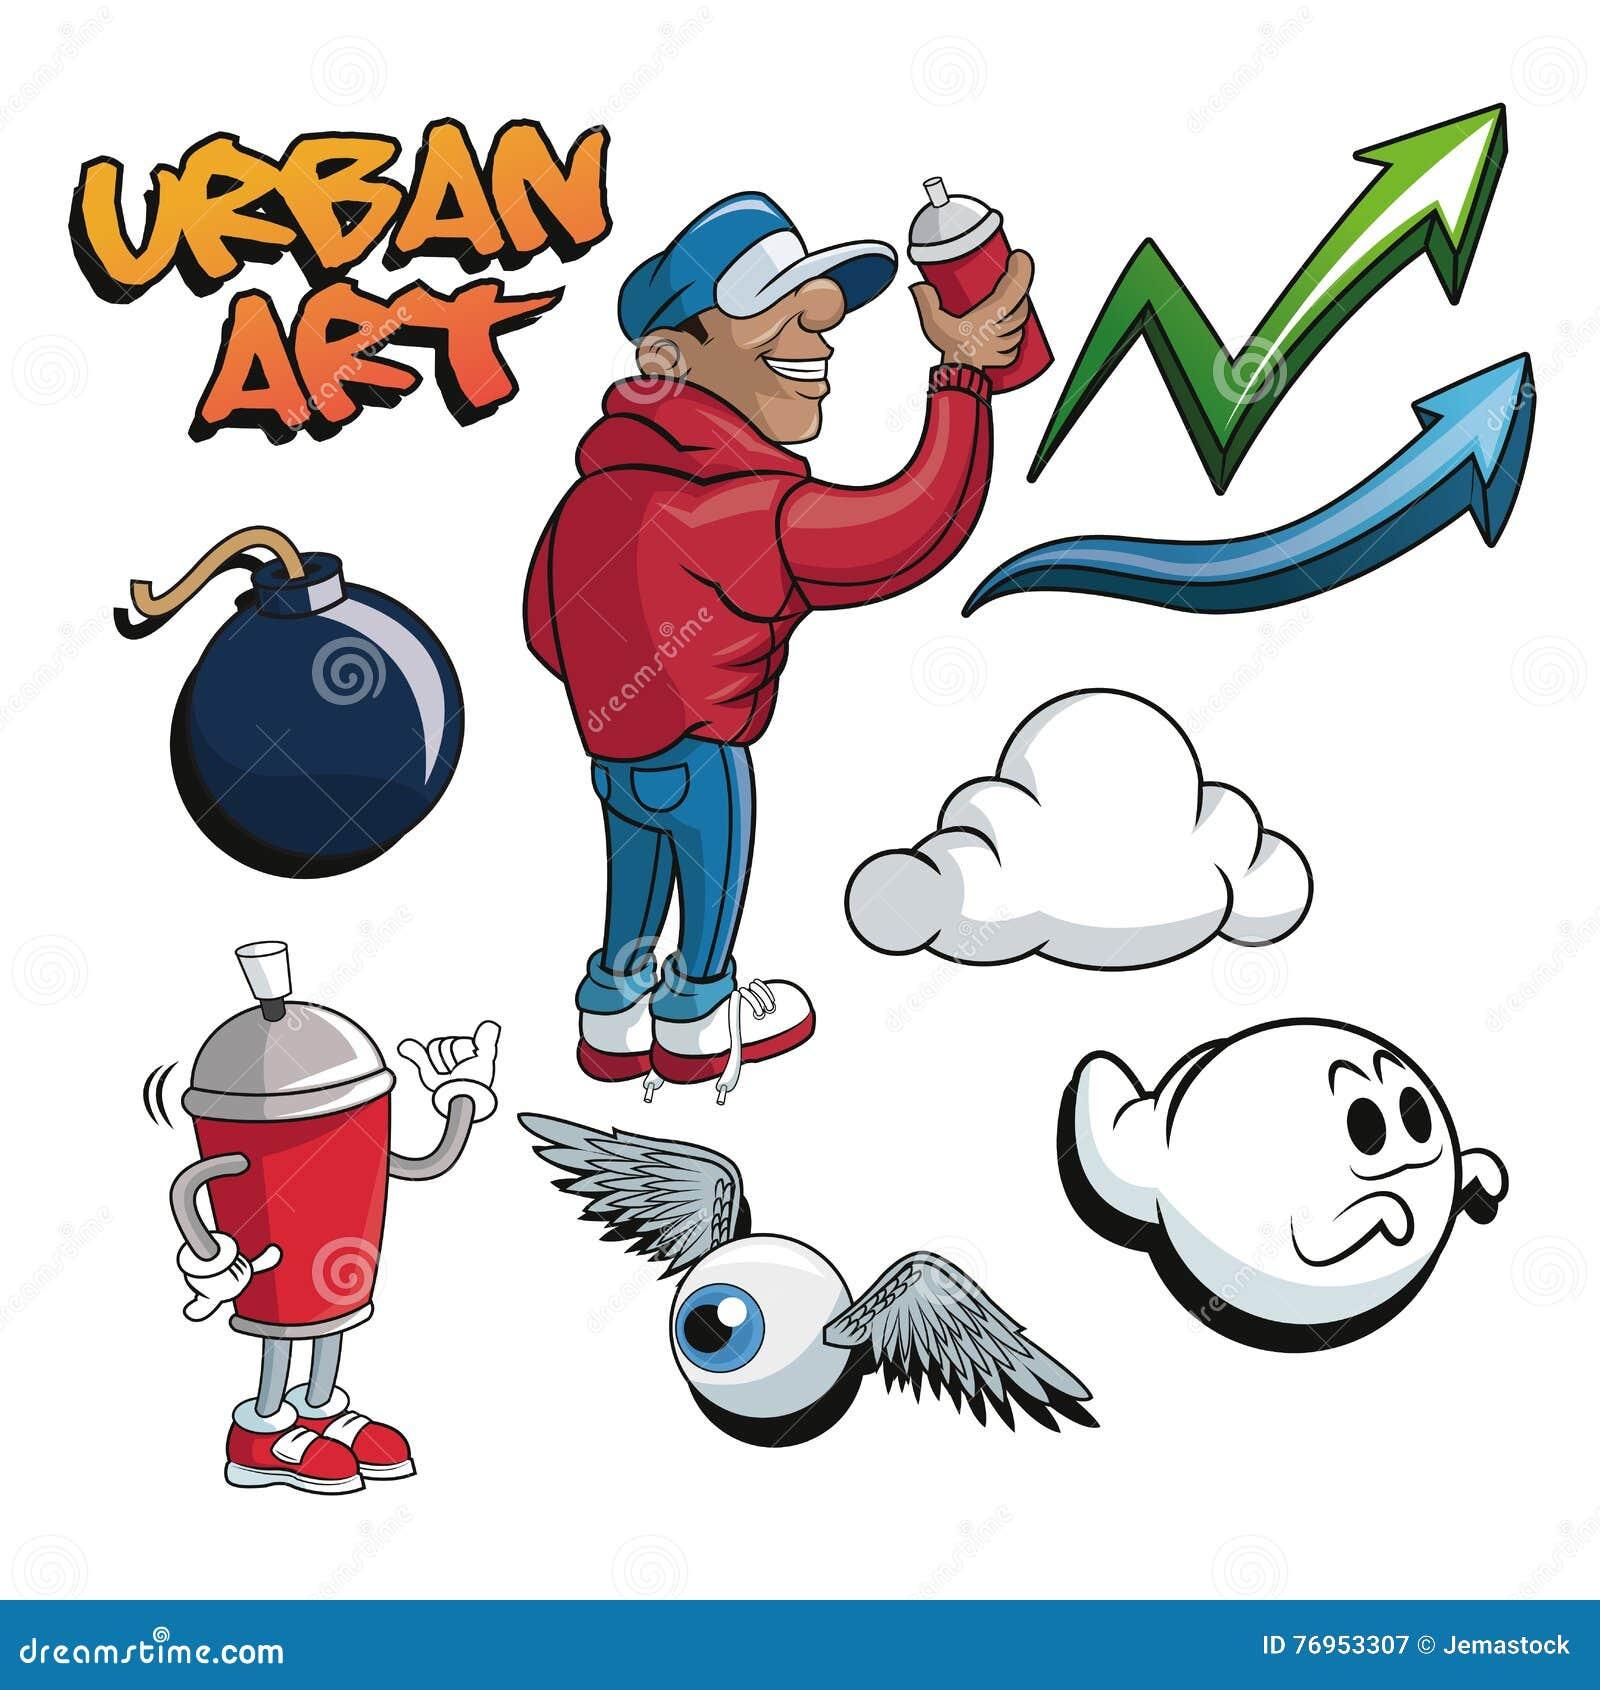 Urban Art And Graffiti Design Stock Vector